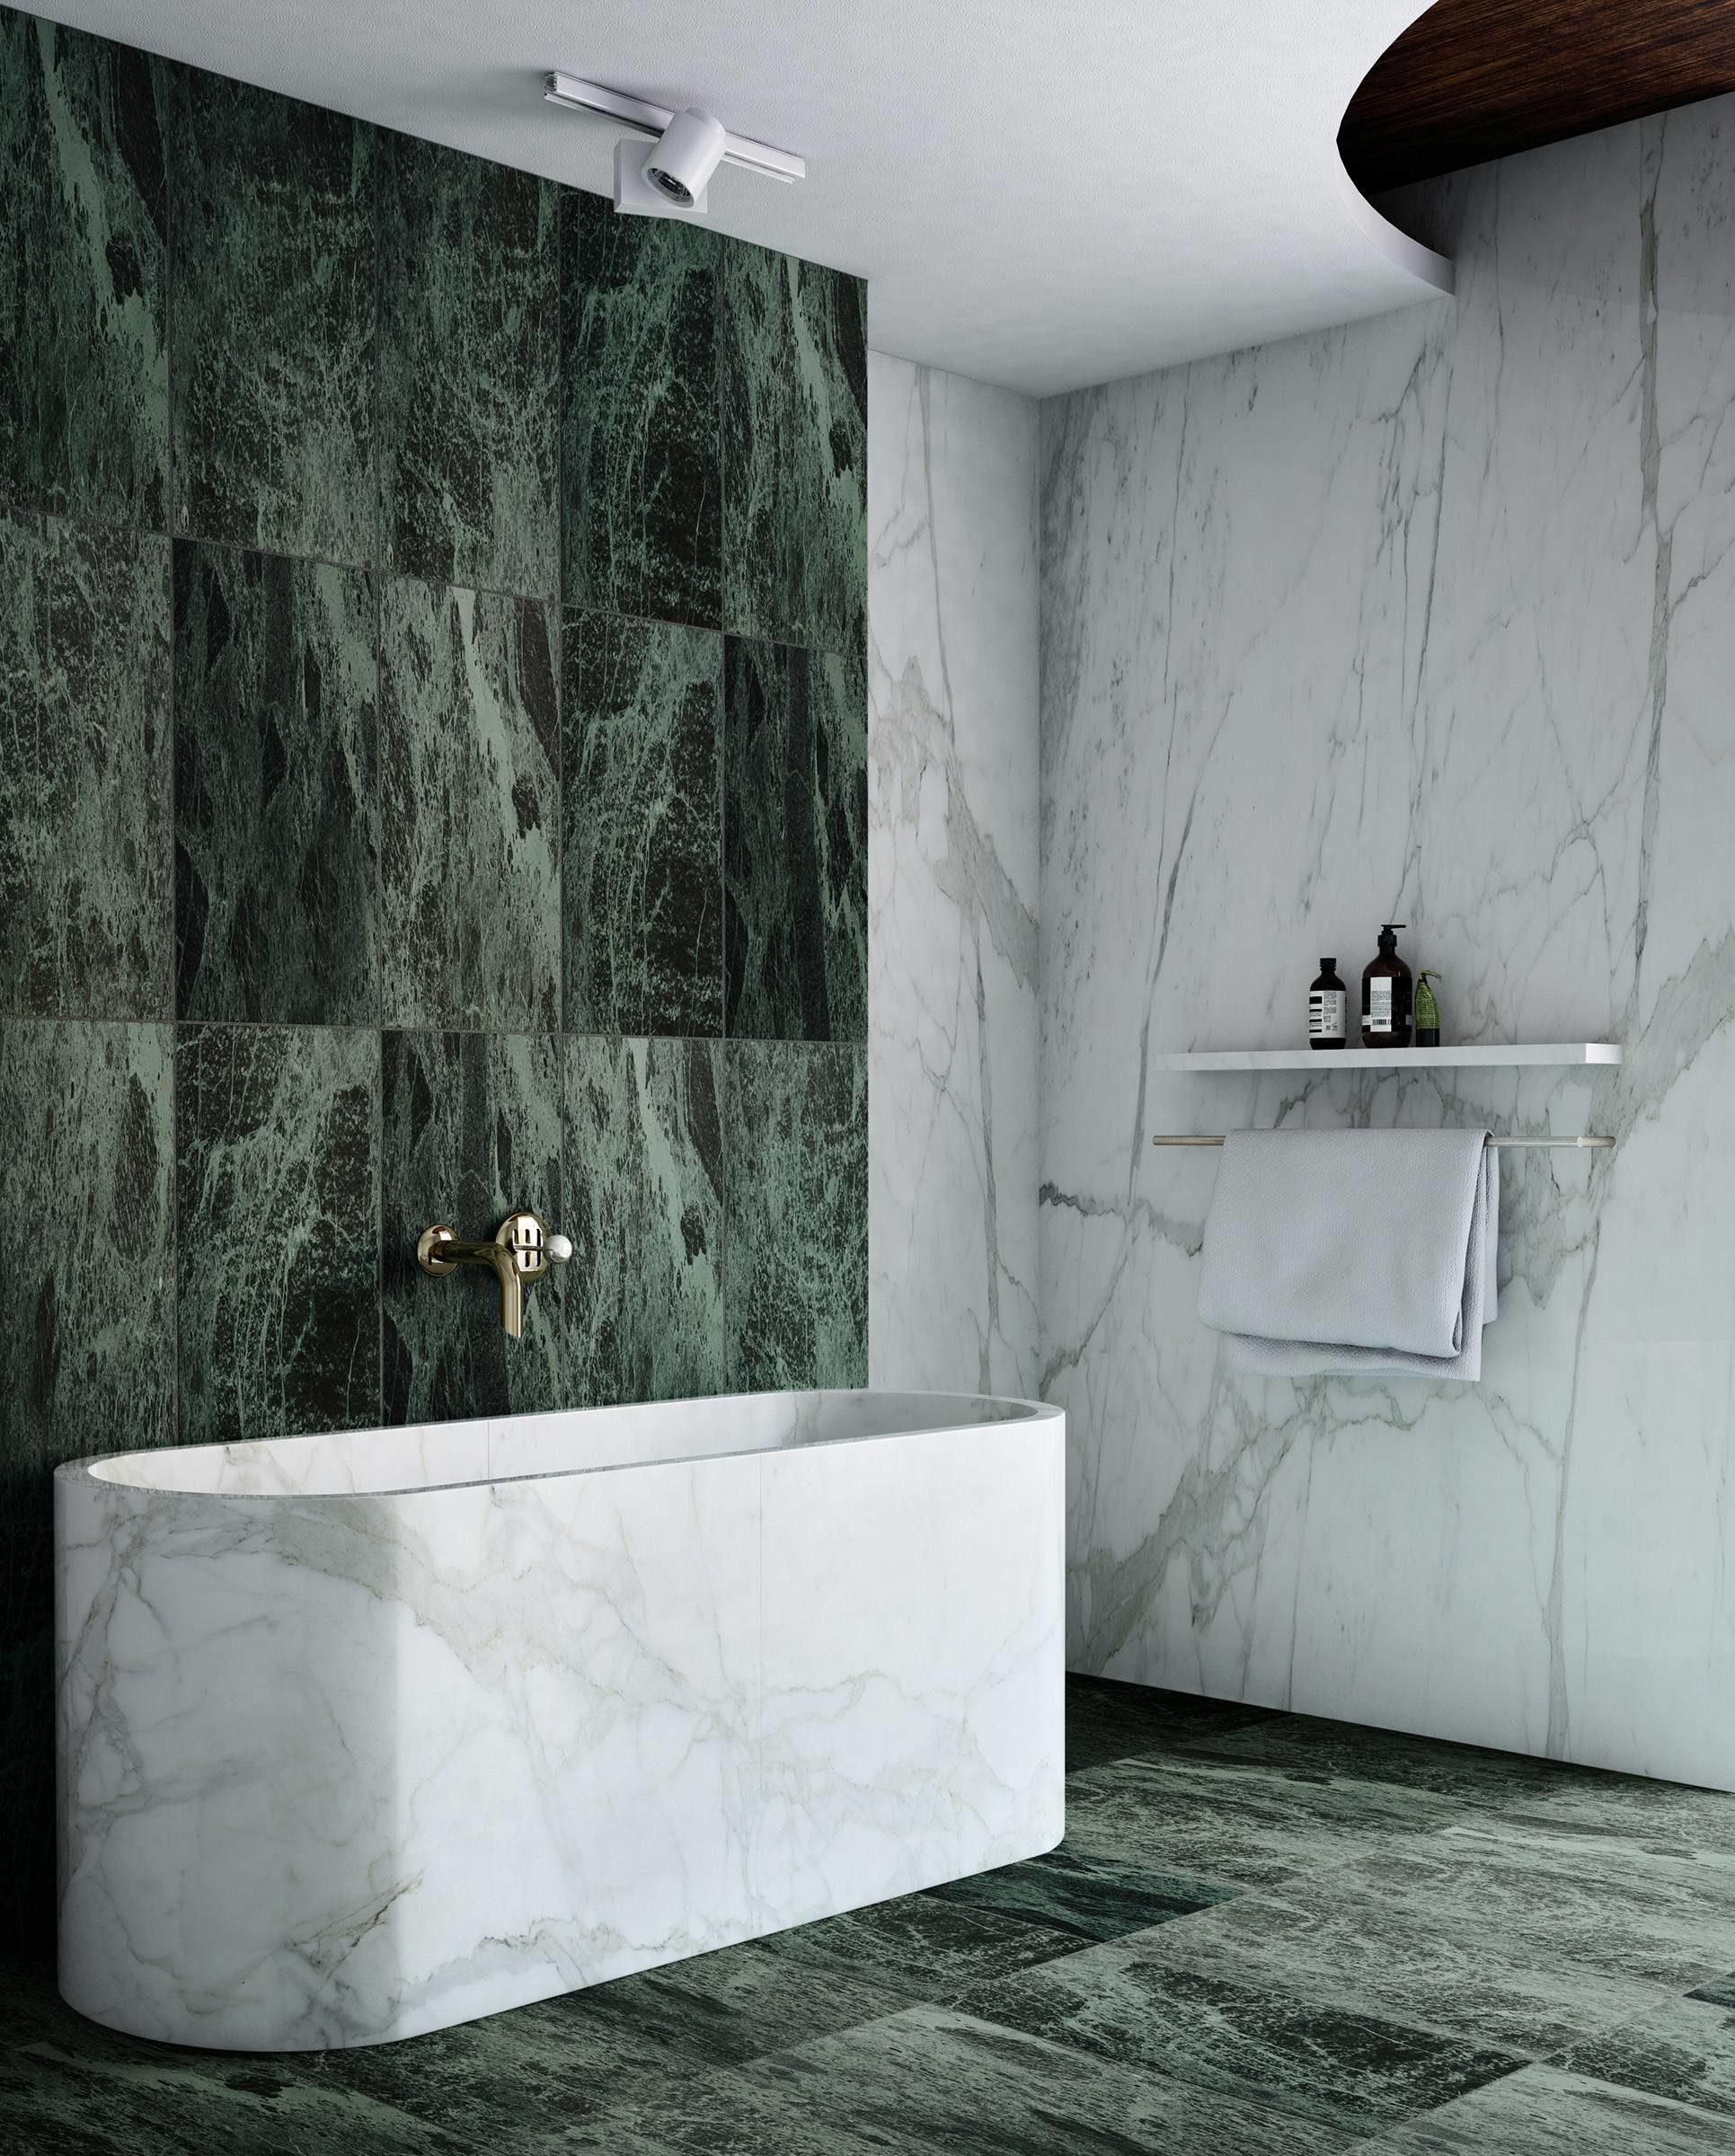 Marble tub and wall bathroom